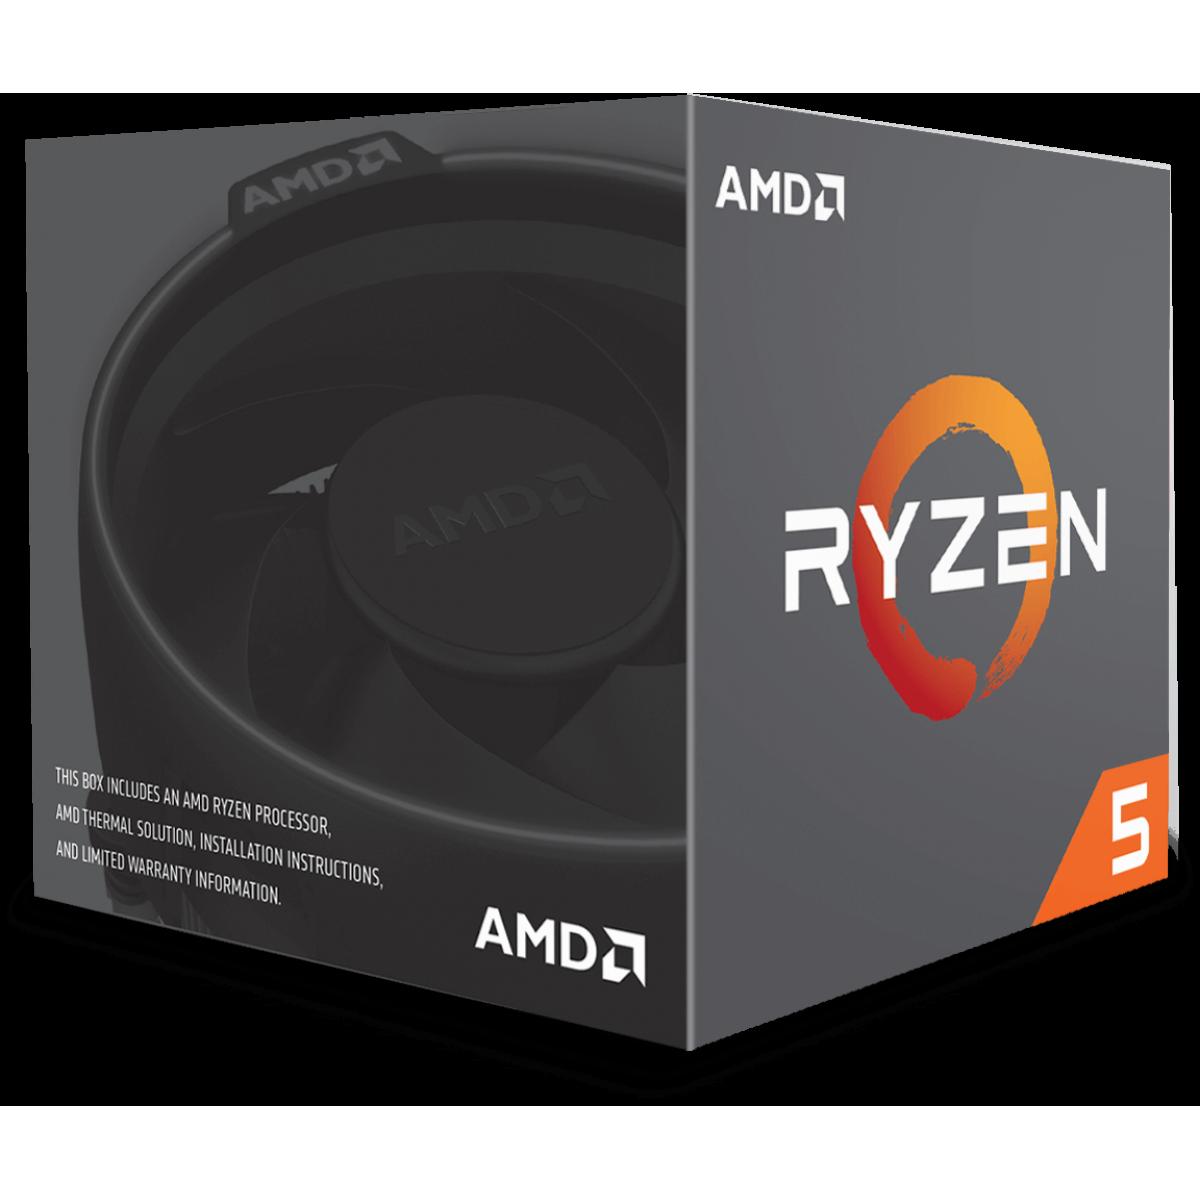 Processador AMD Ryzen 5 2600 3.4GHz (3.9GHz Turbo), 6-Cores 12-Threads, Cooler Wraith Stealth, AM4, YD2600BBAFBOX, S/ Video